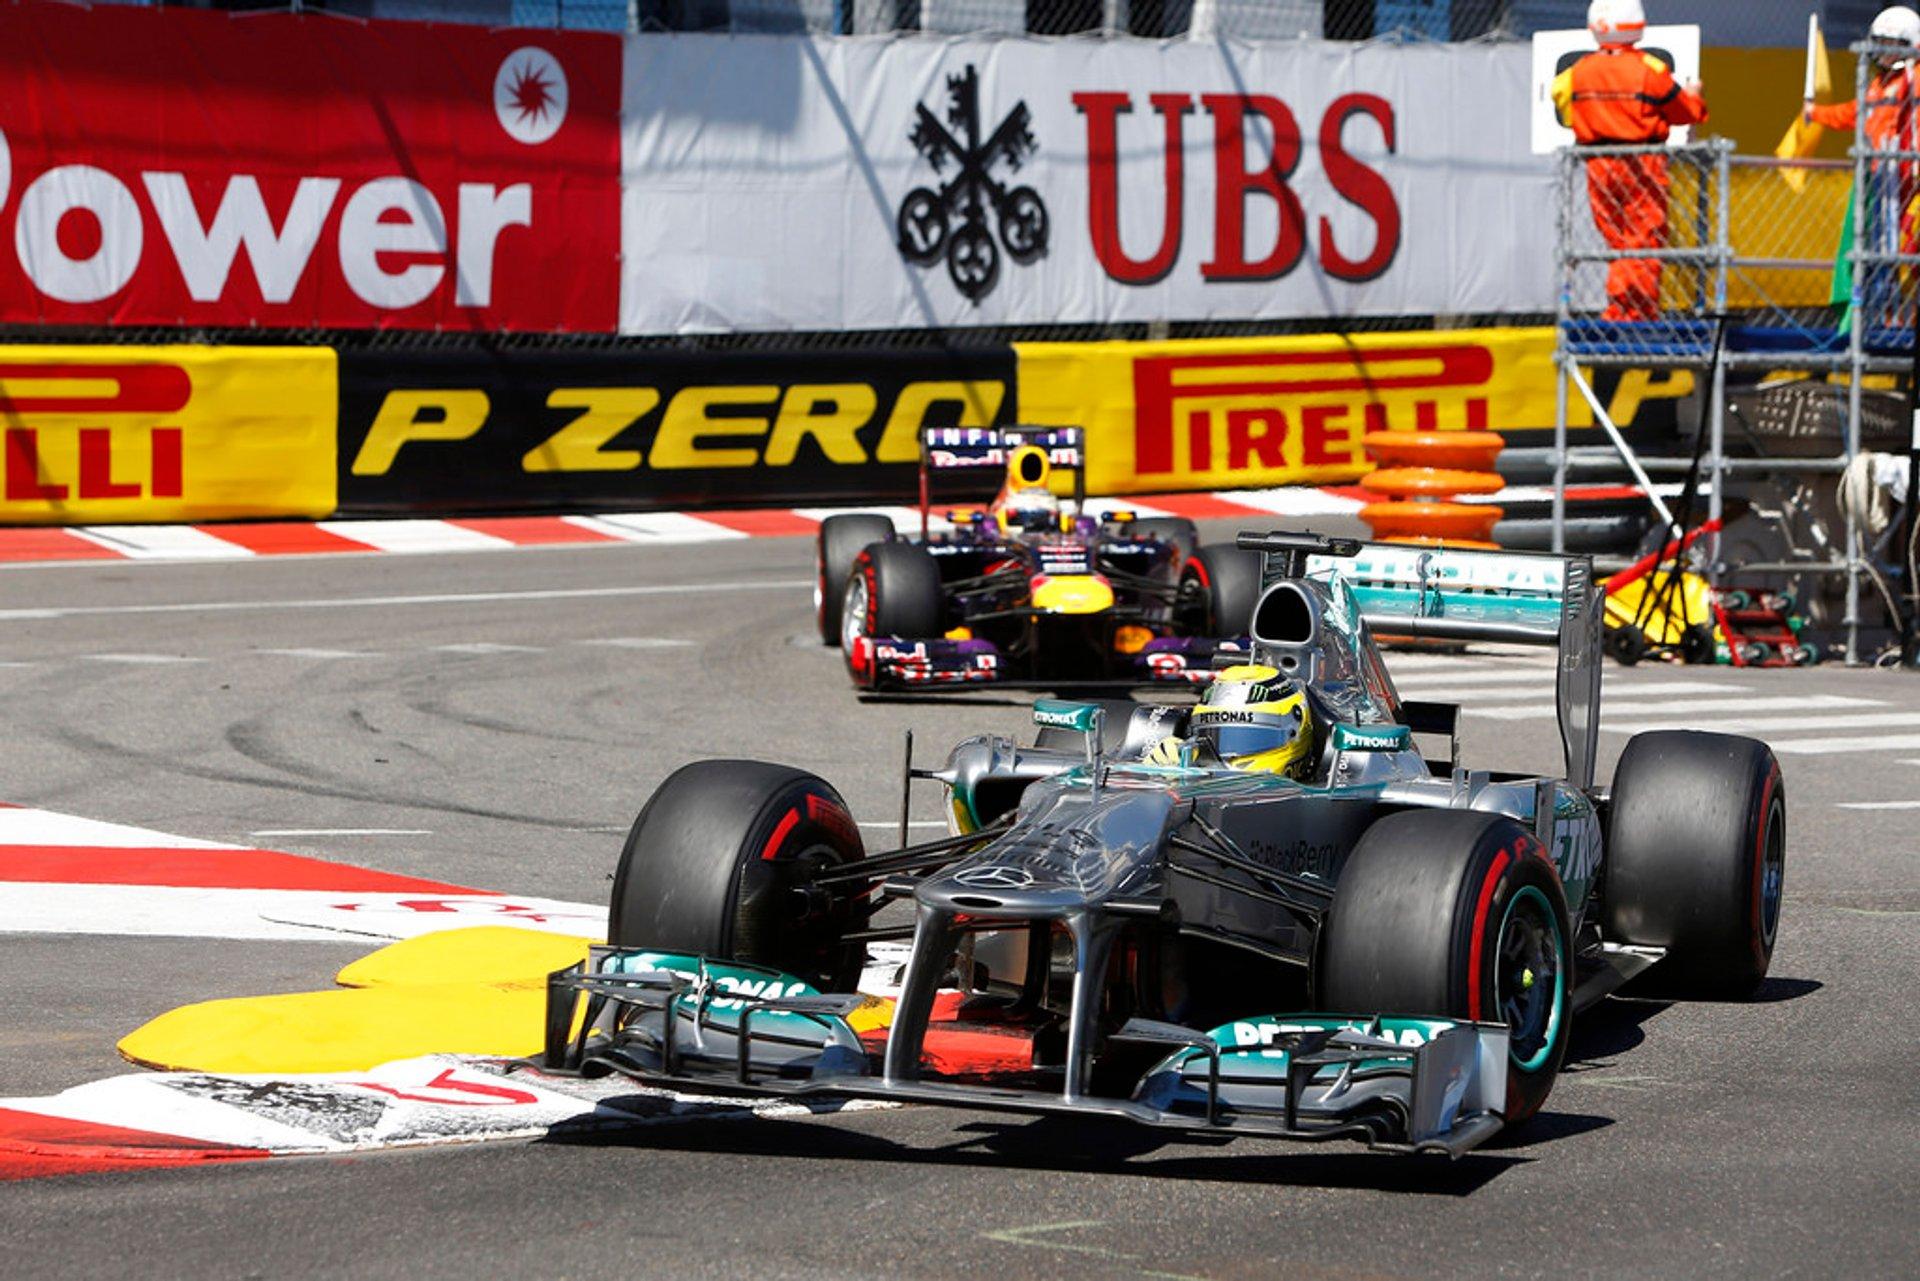 F1 Monaco Grand Prix in Monaco 2020 - Best Time